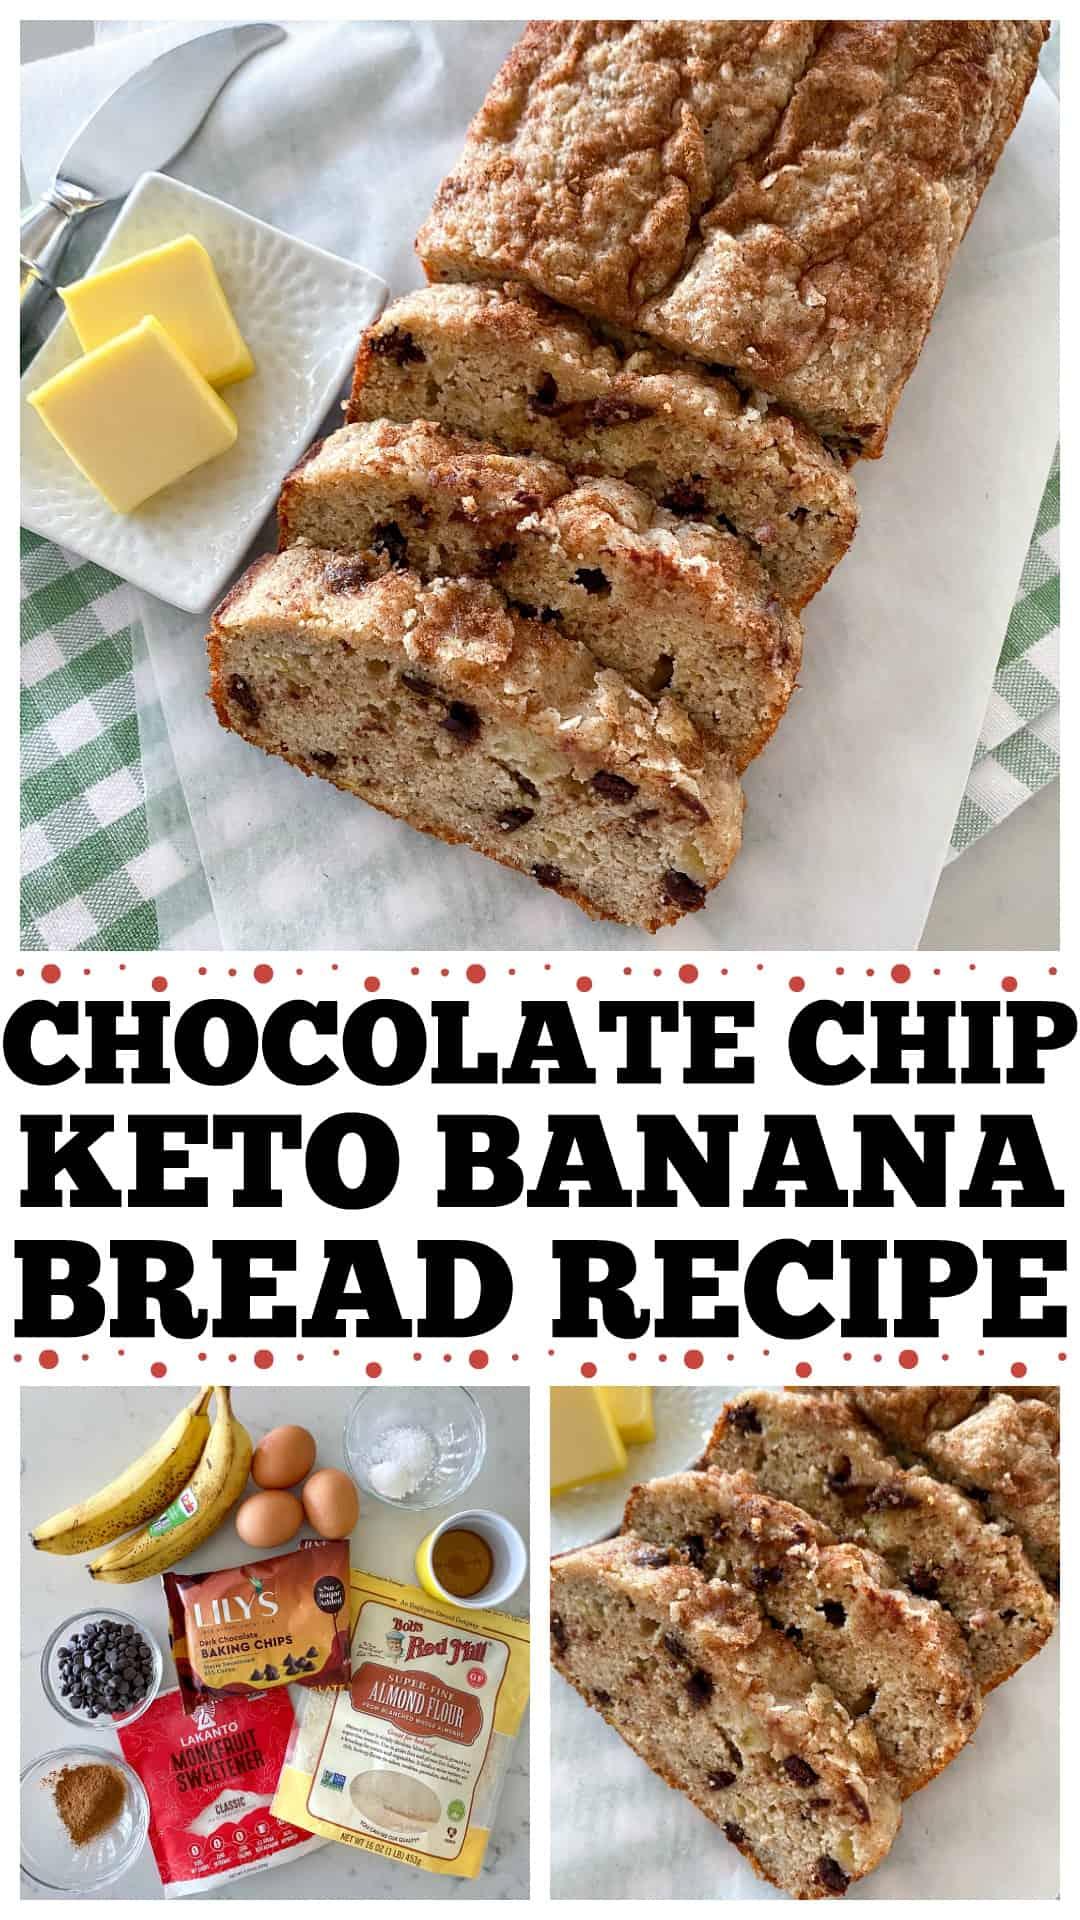 keto banana bread Pin for Pinterest